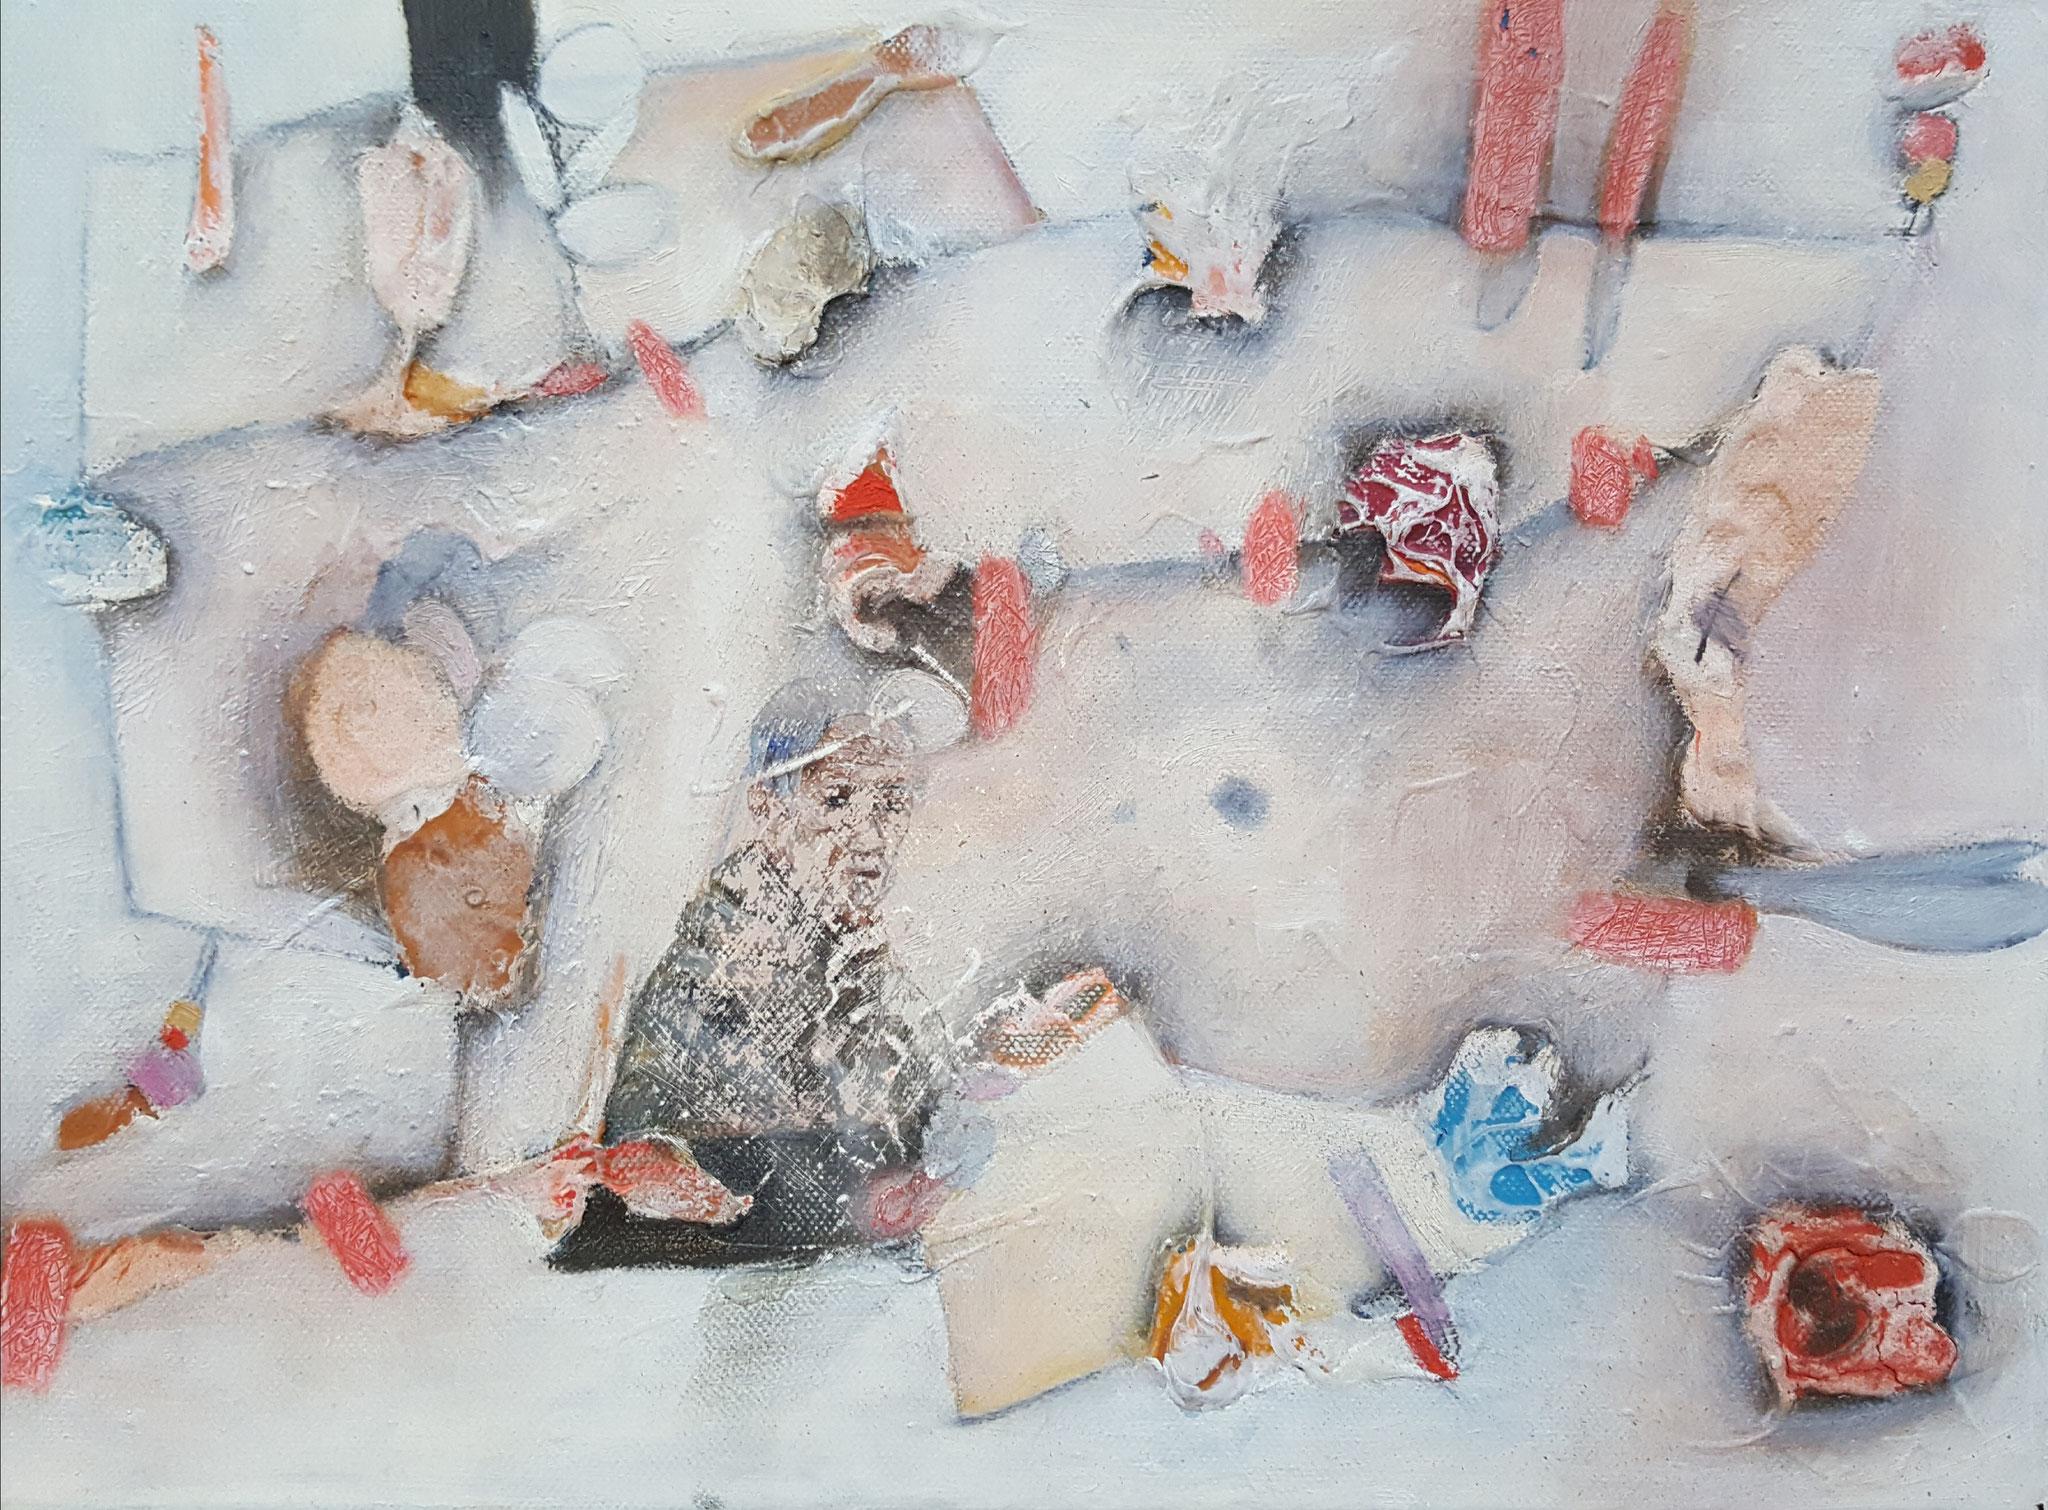 Des-aparecidos IV, 2018, 40 x 30 cm, Mixed media on canvas